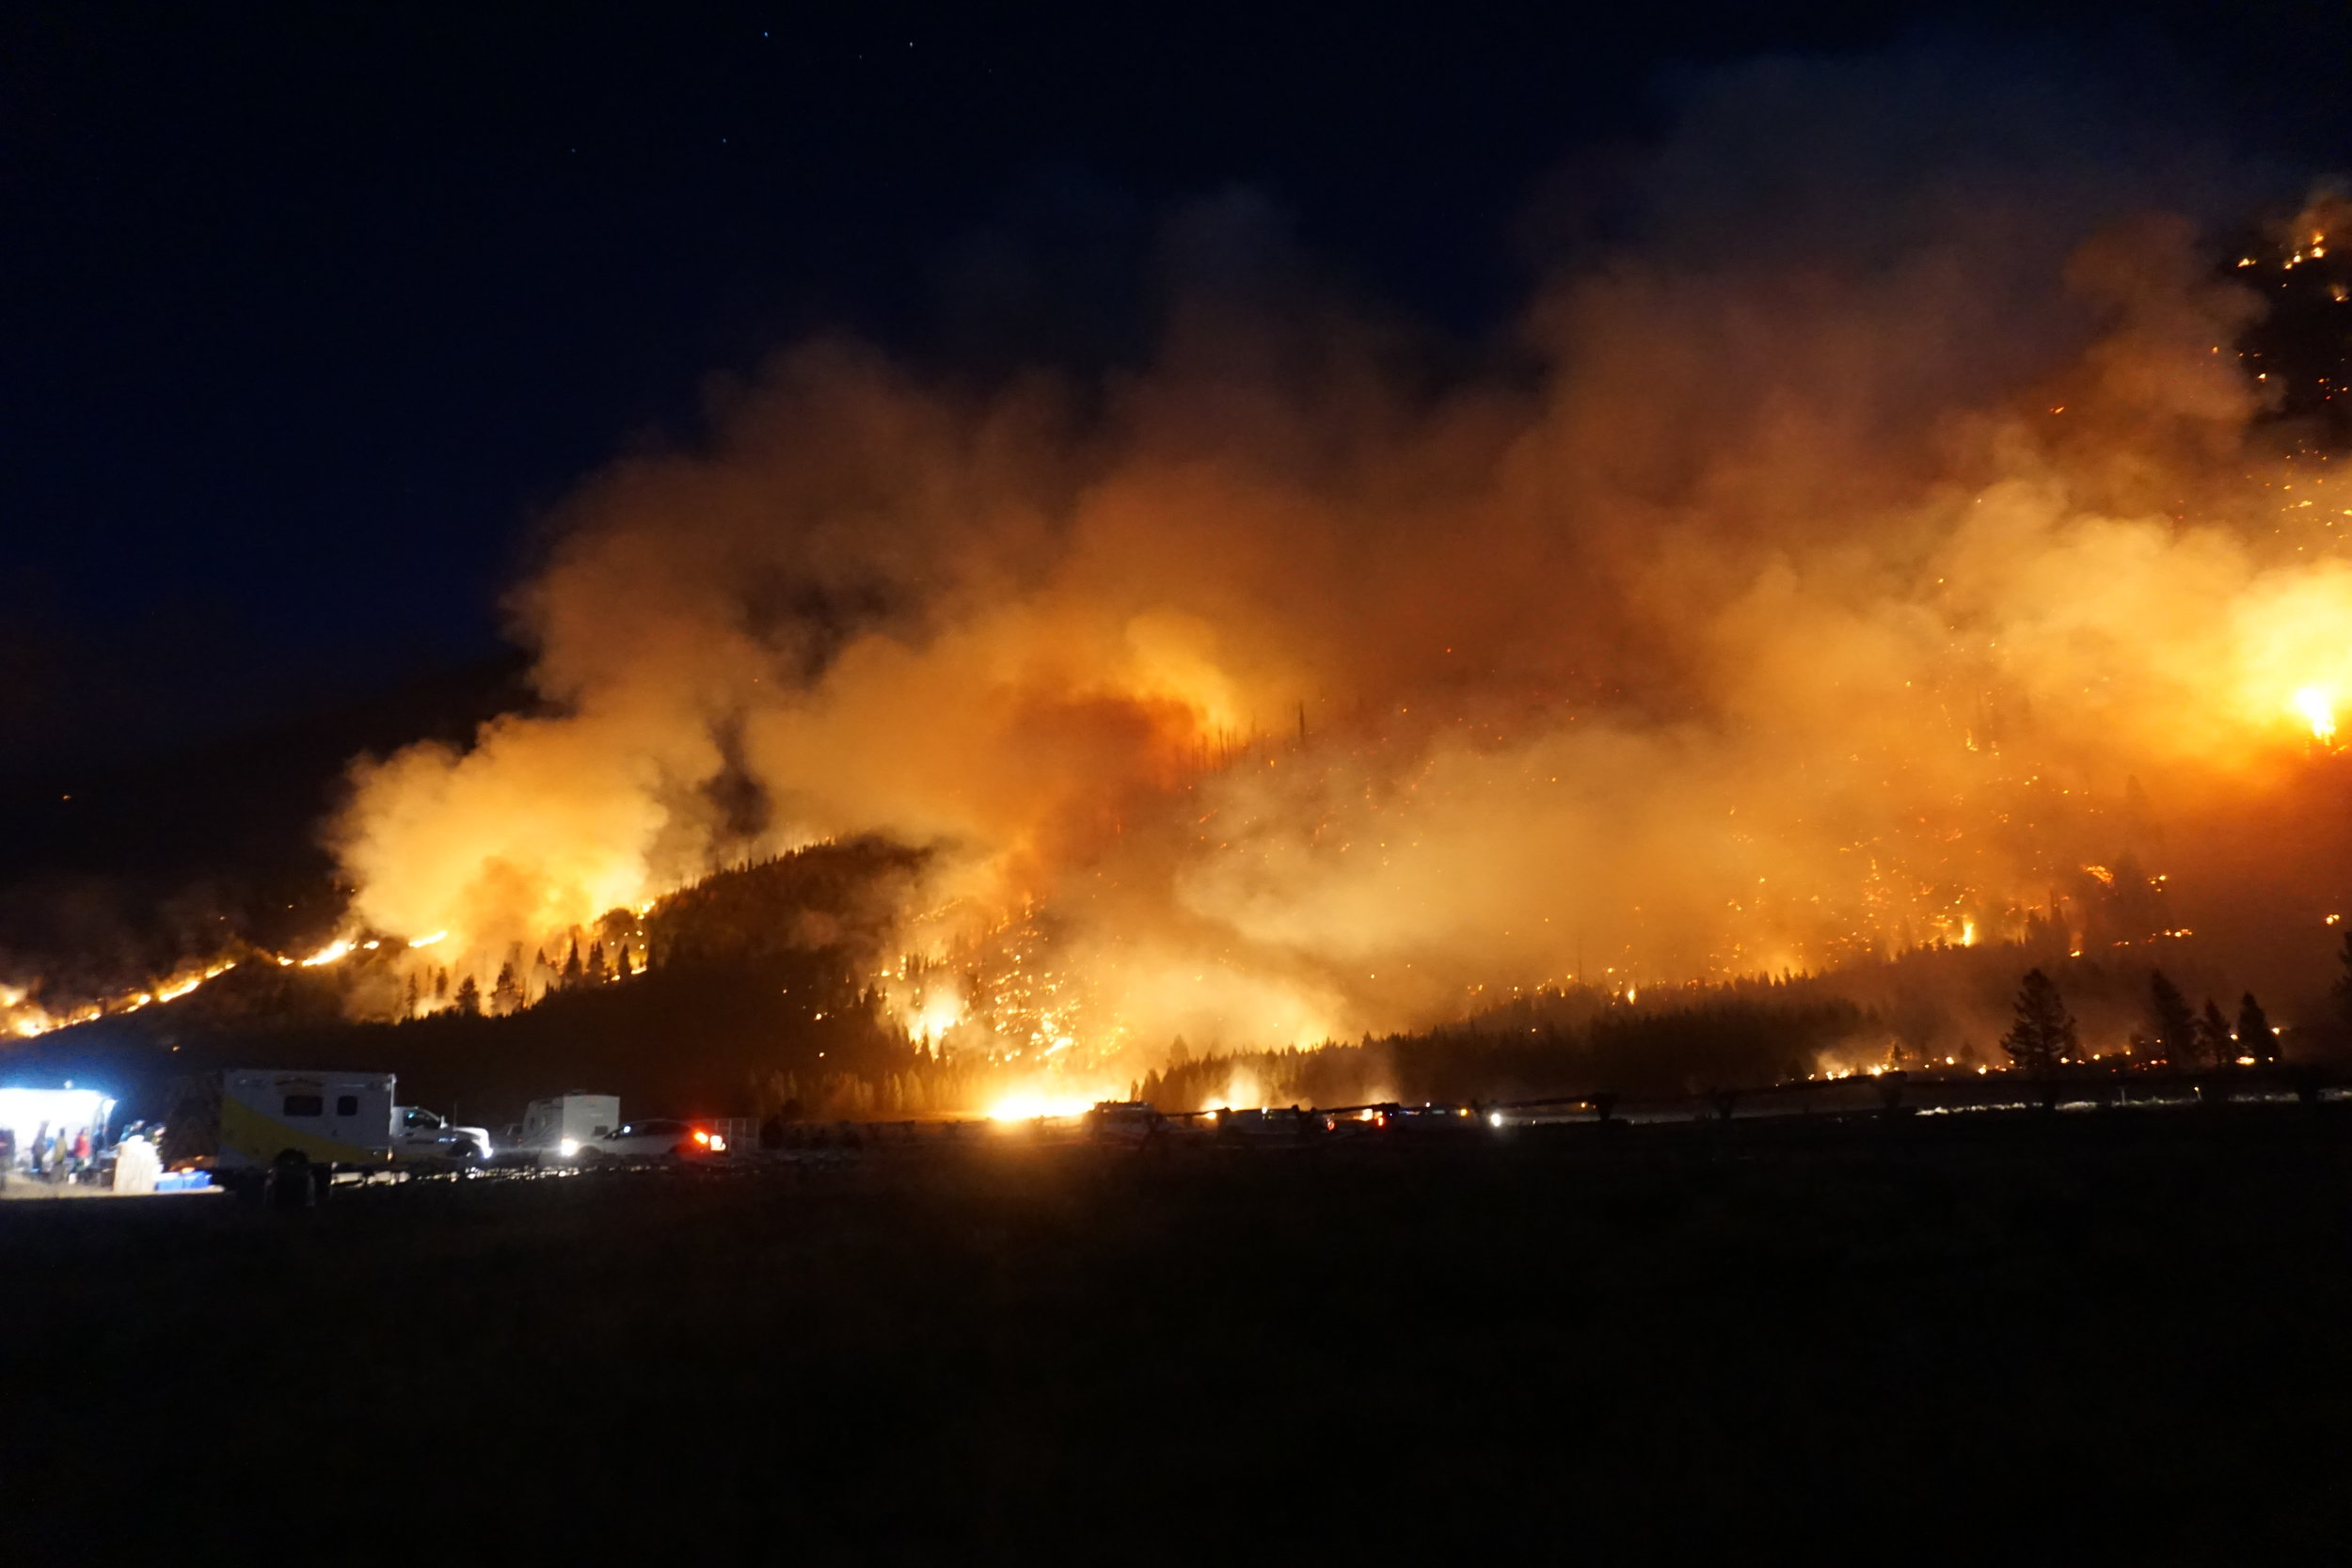 Wildfire Suppression 101  Explore Big Sky Magazine  August 2017